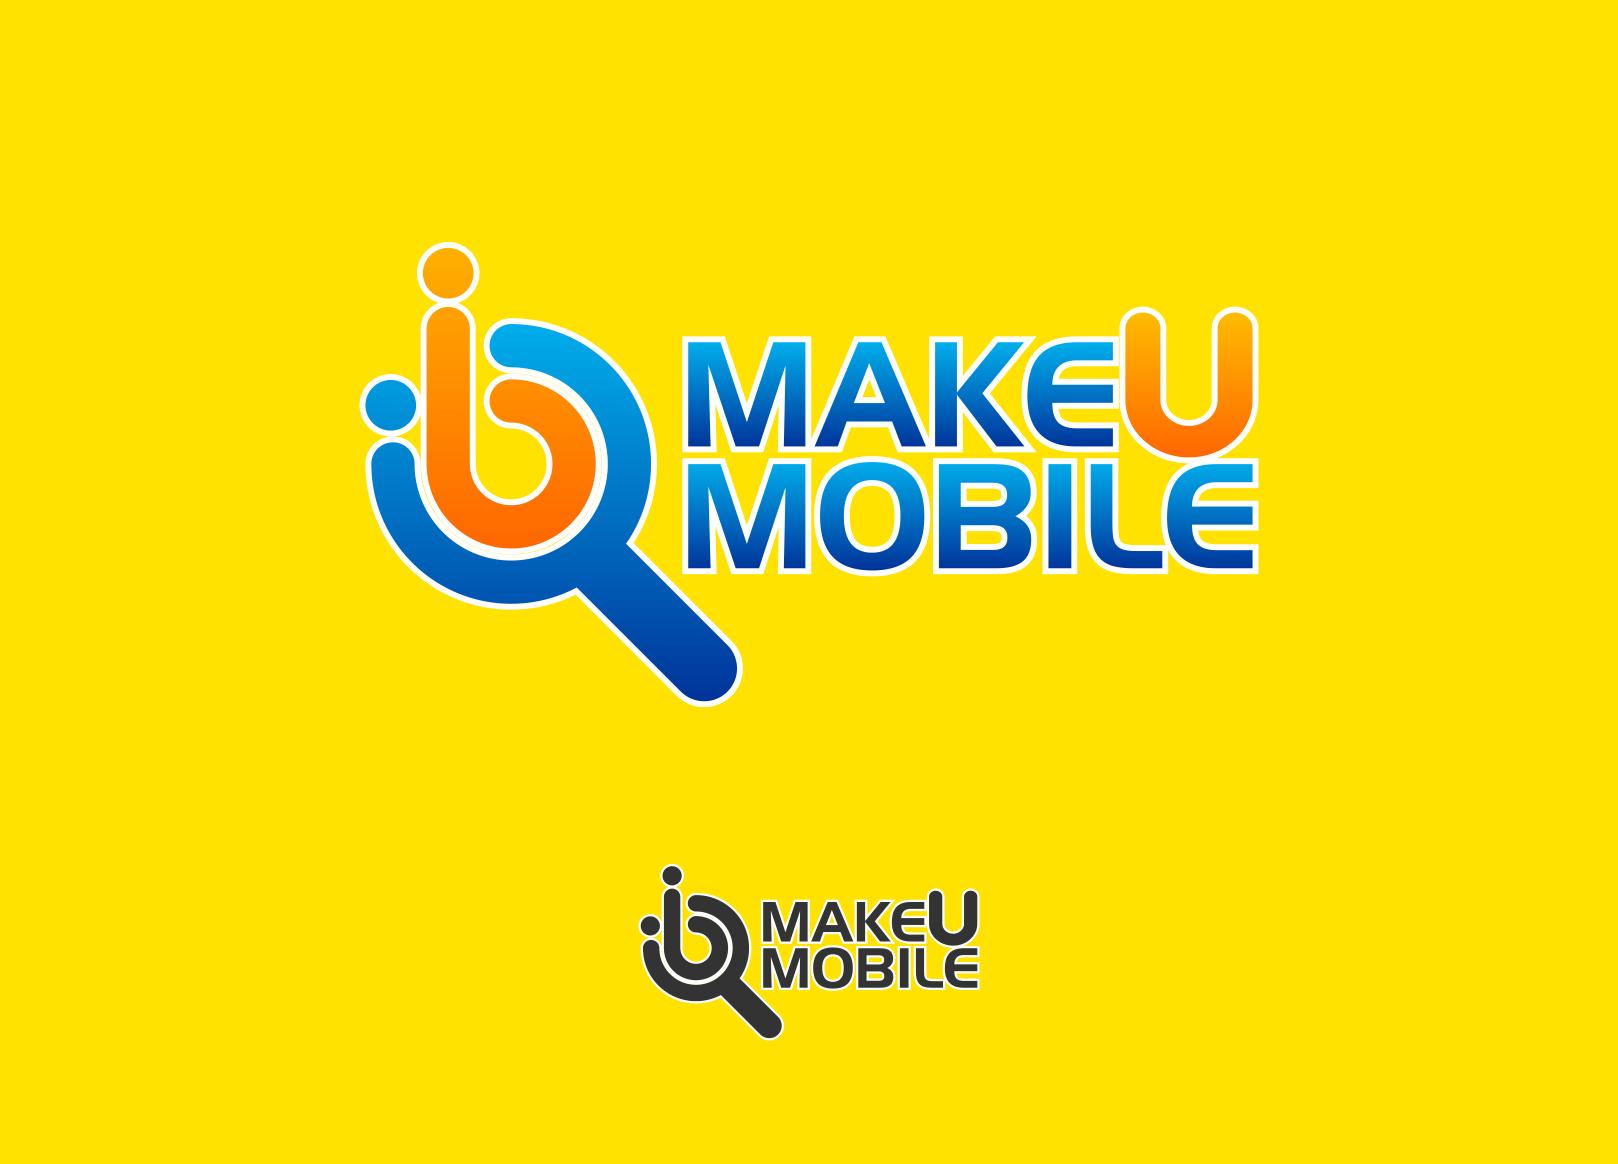 Create the next logo for Make - U -Mobile